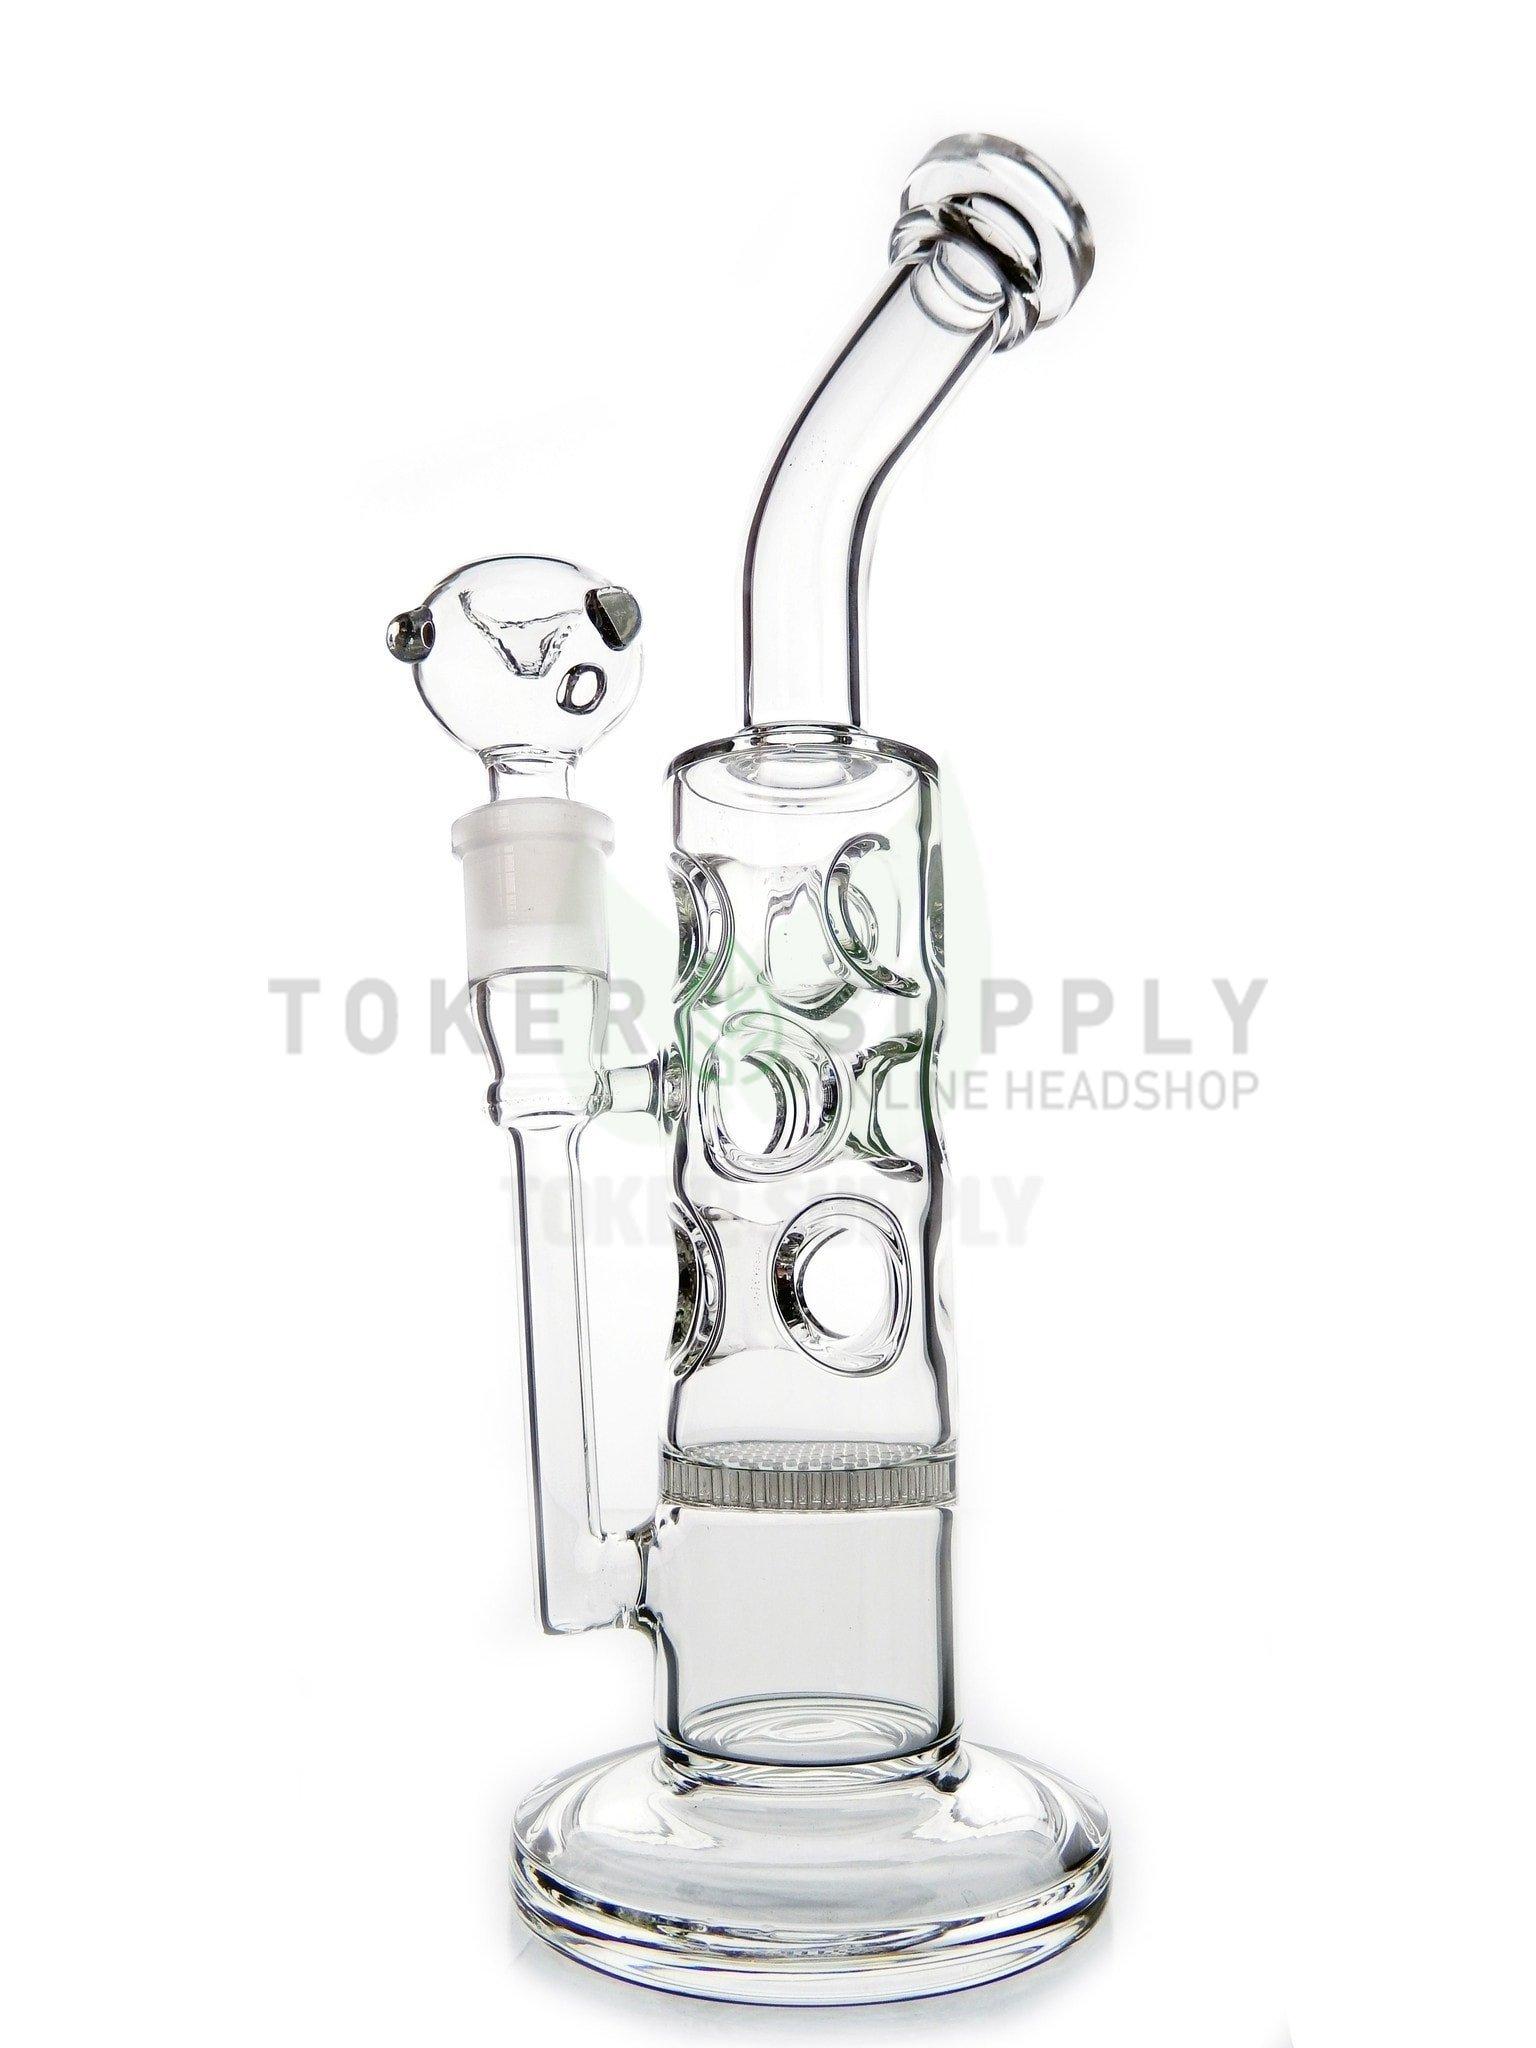 1536x2048 Swiss Honeycomb Water Pipe Online Headshop